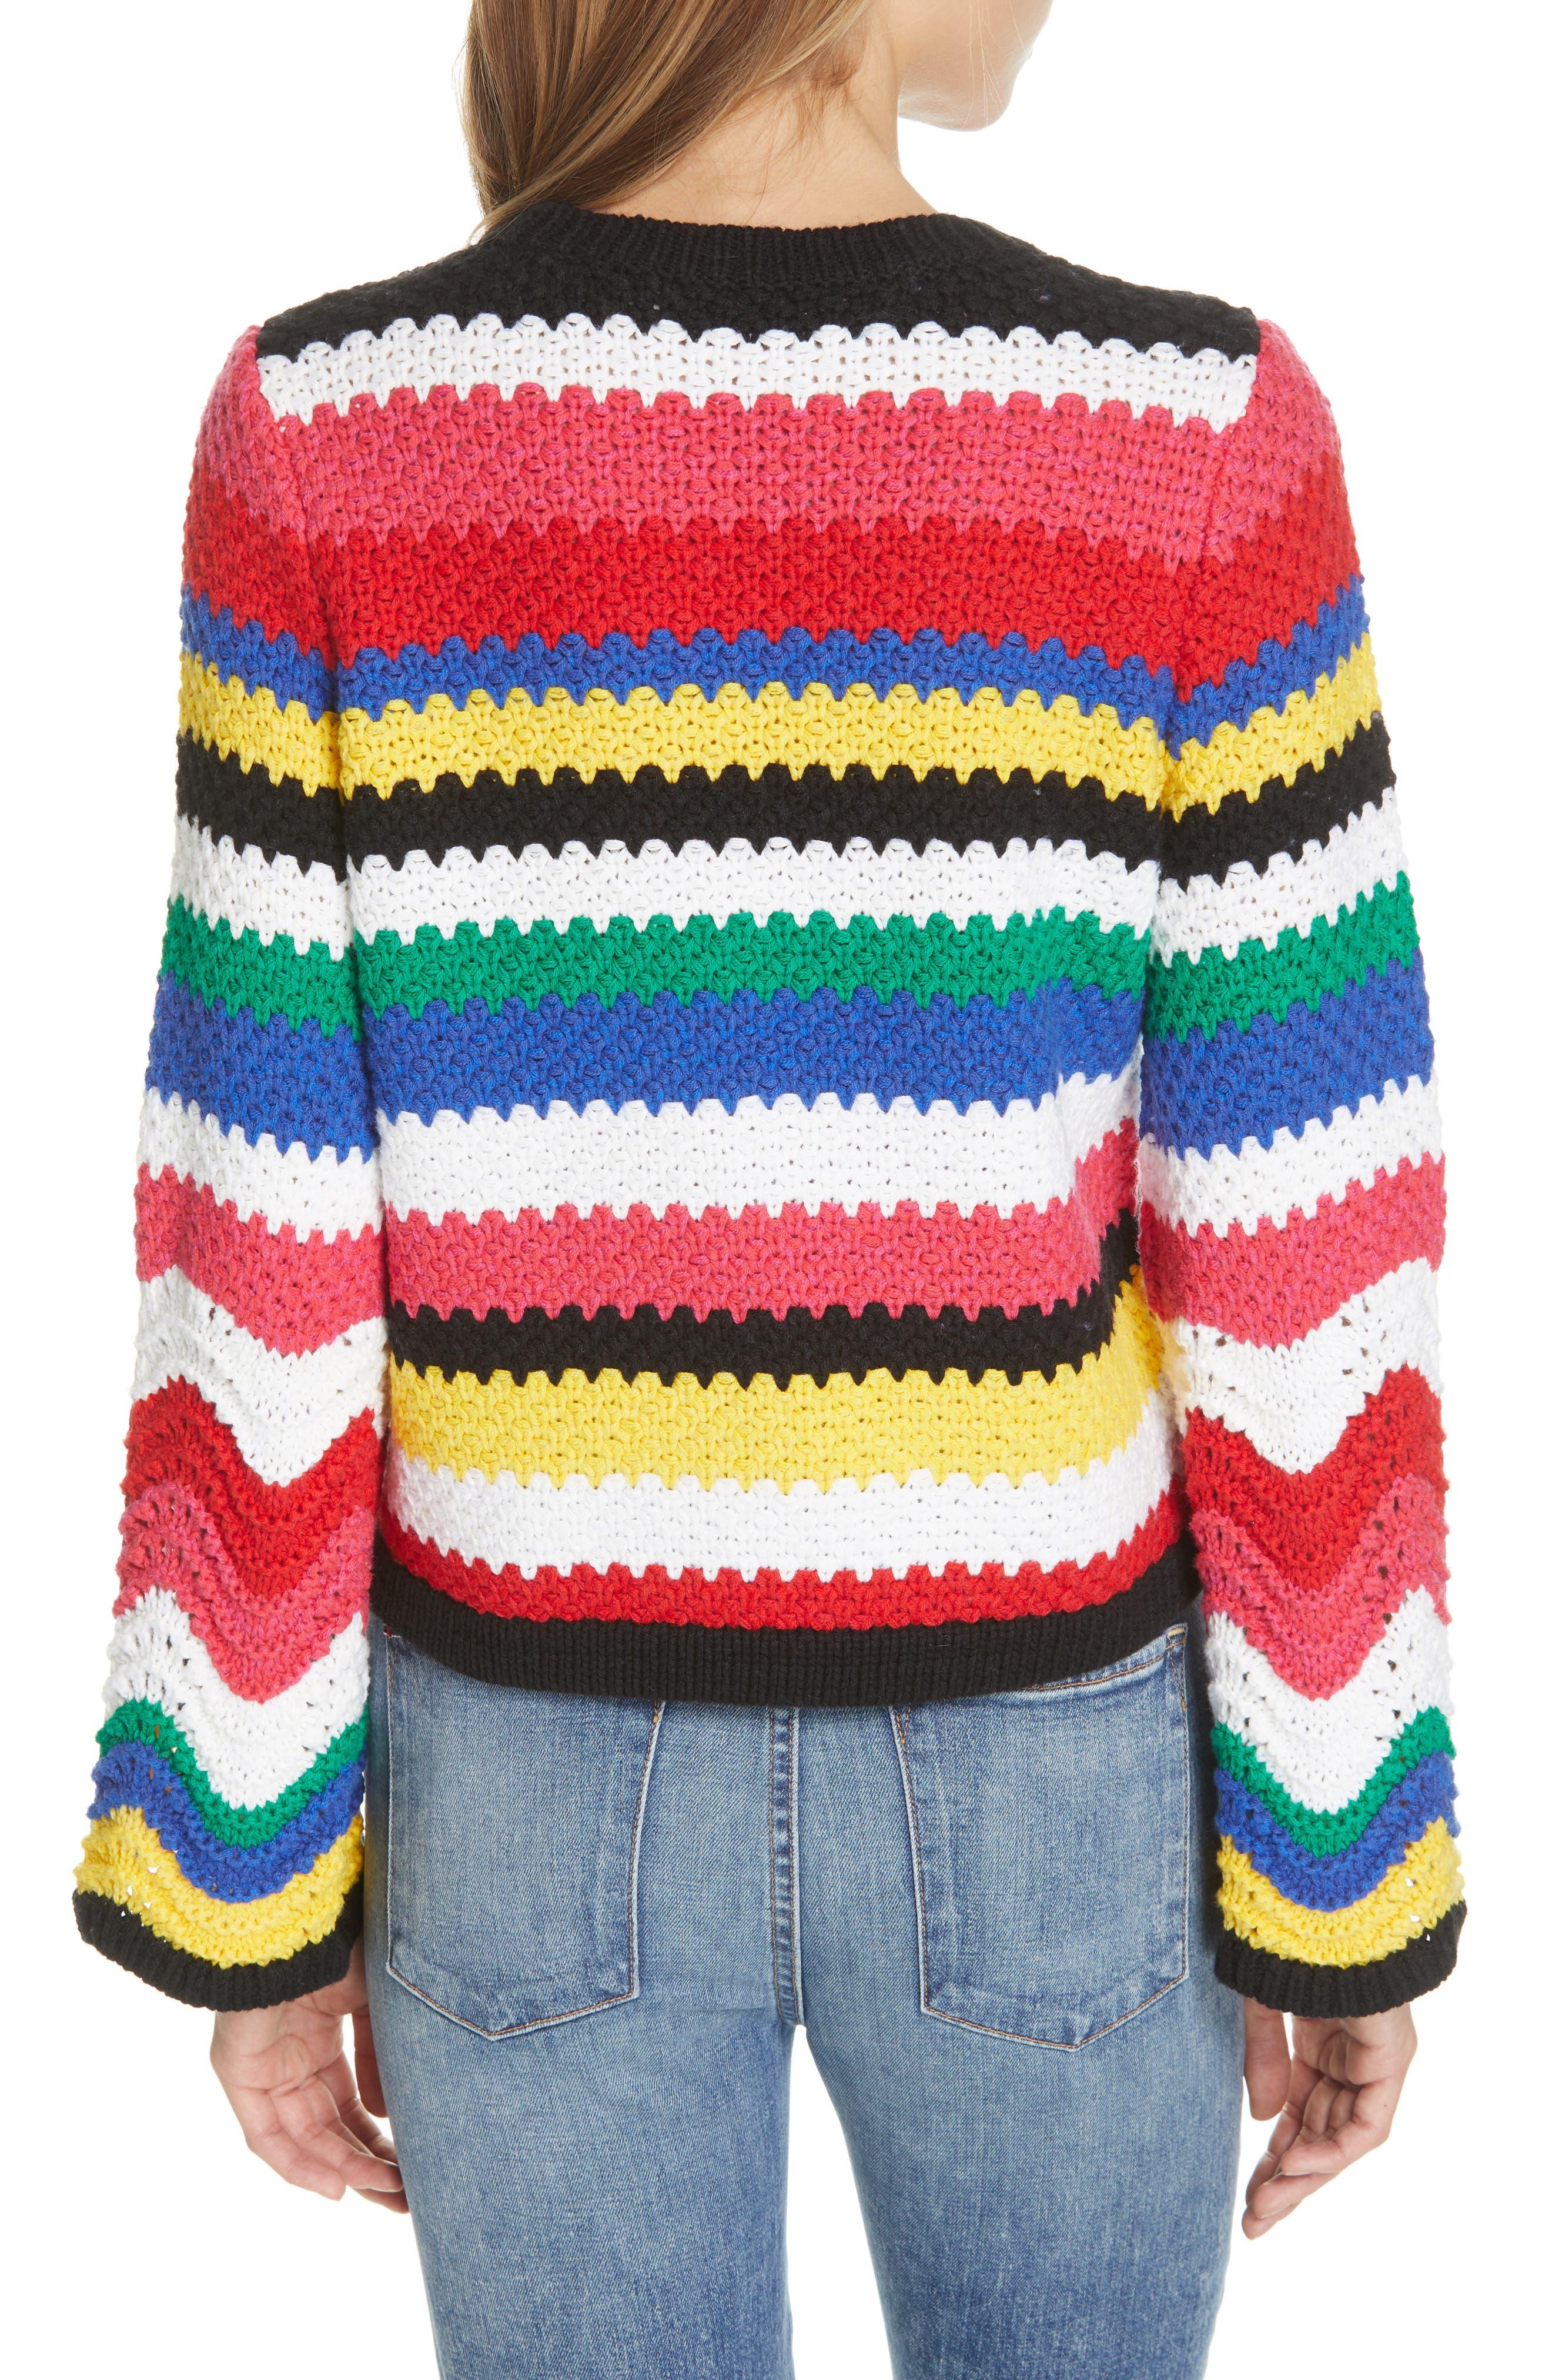 ALICE + OLIVIA, Alivia Stripe Bell Sleeve Cotton Blend Sweater, Alternate thumbnail 2, color, MULTI